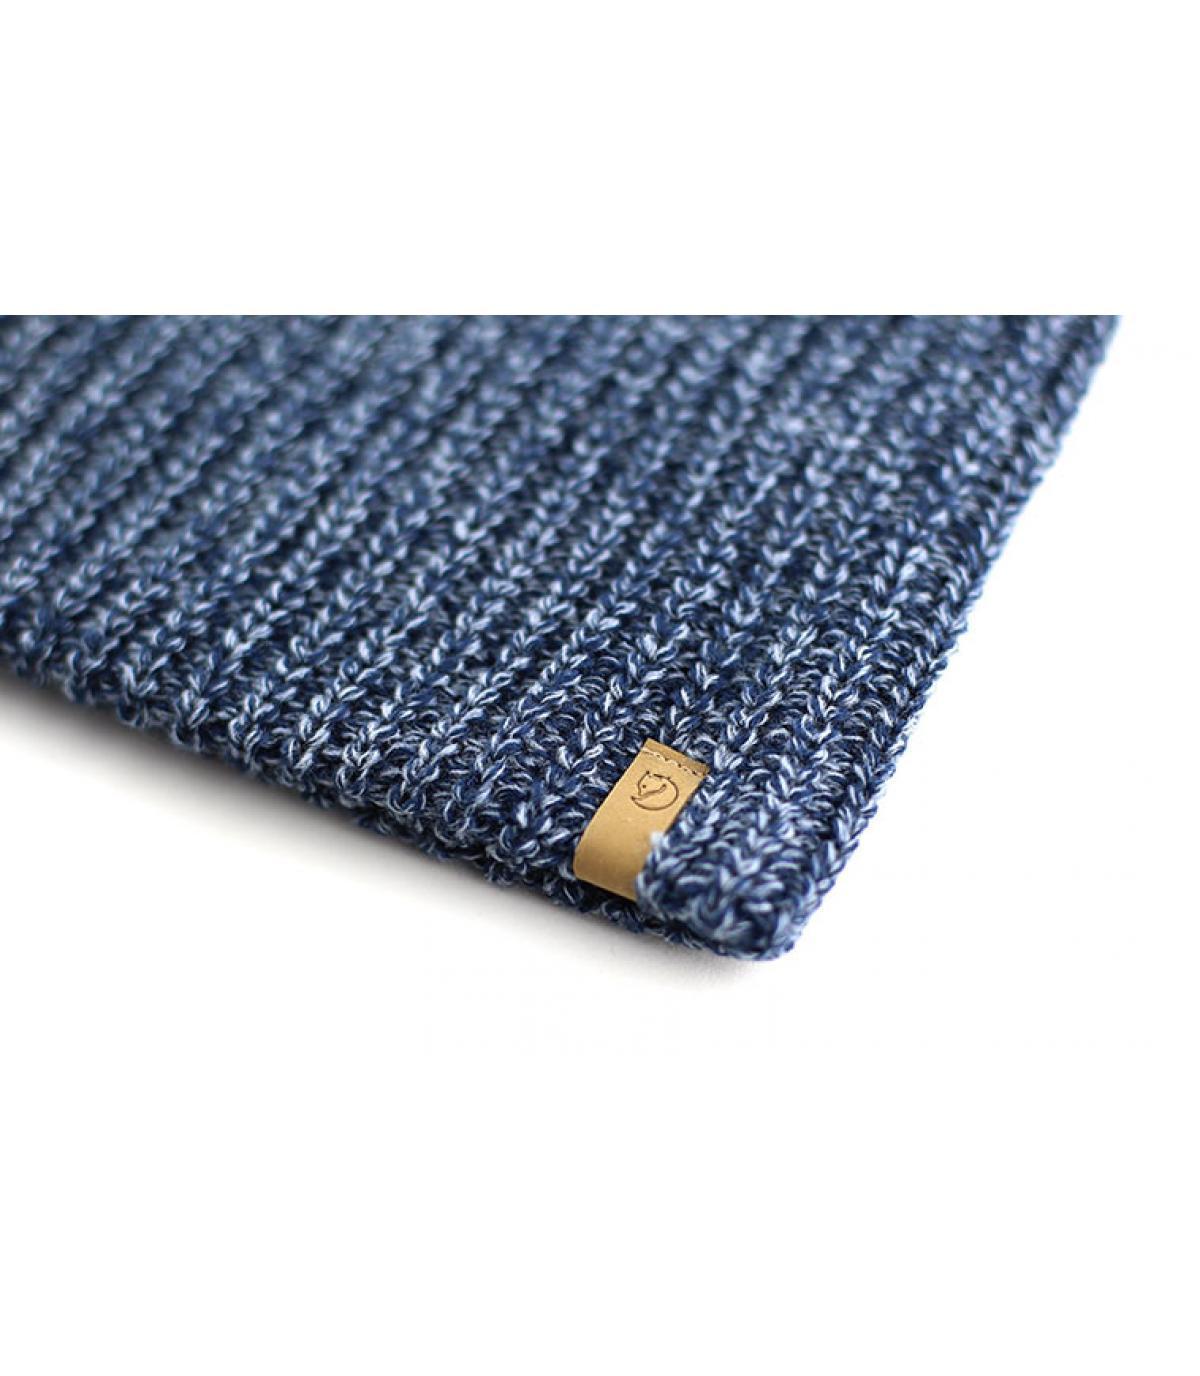 Details Ovik blueberry - Abbildung 3